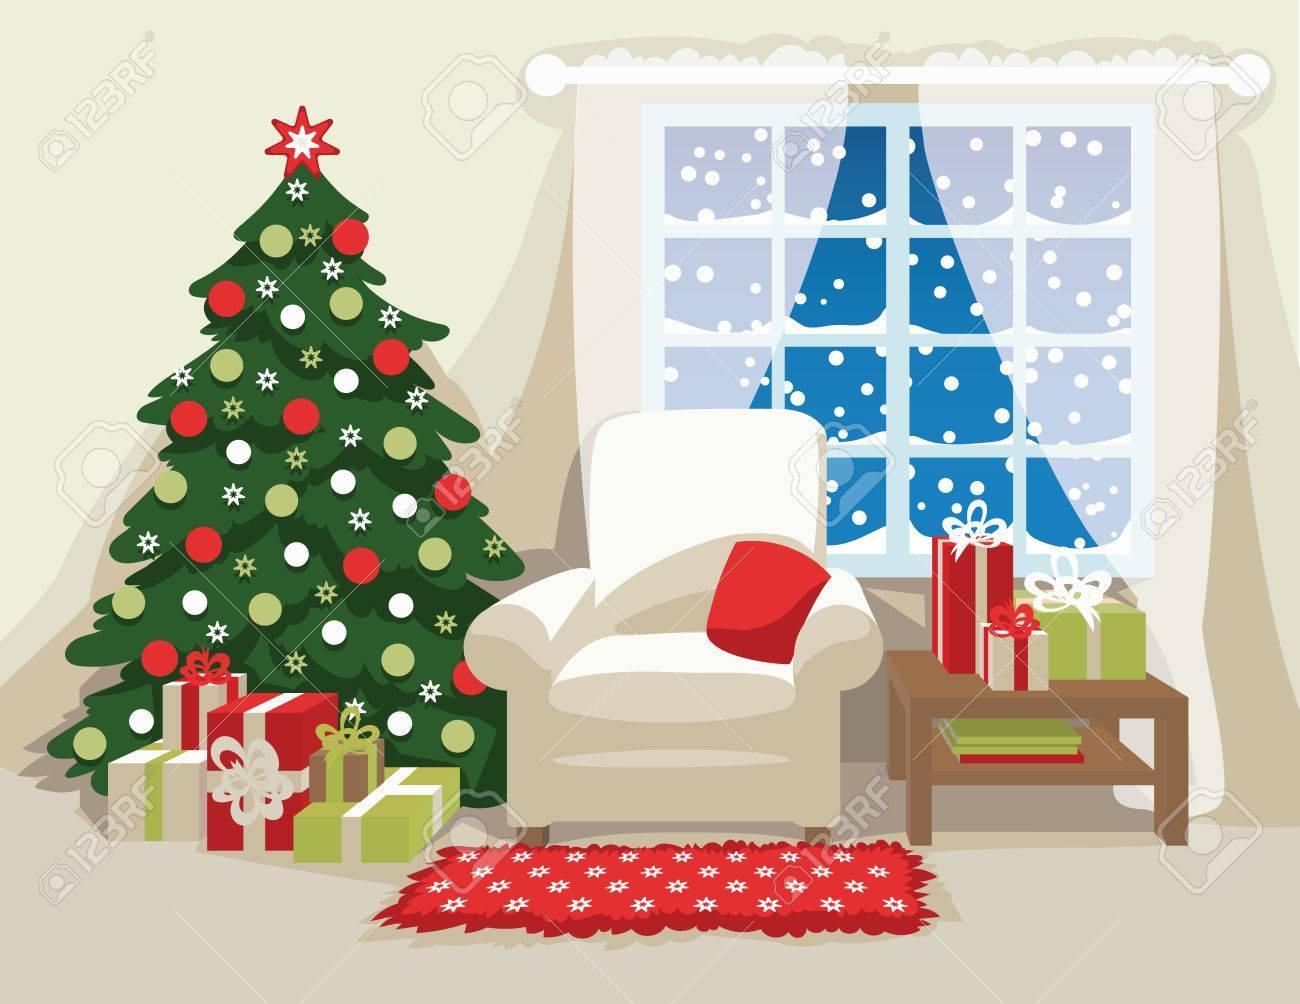 Weihnachten Innenraum. Bequeme Sessel Mit Kissen, Geschmückten ...